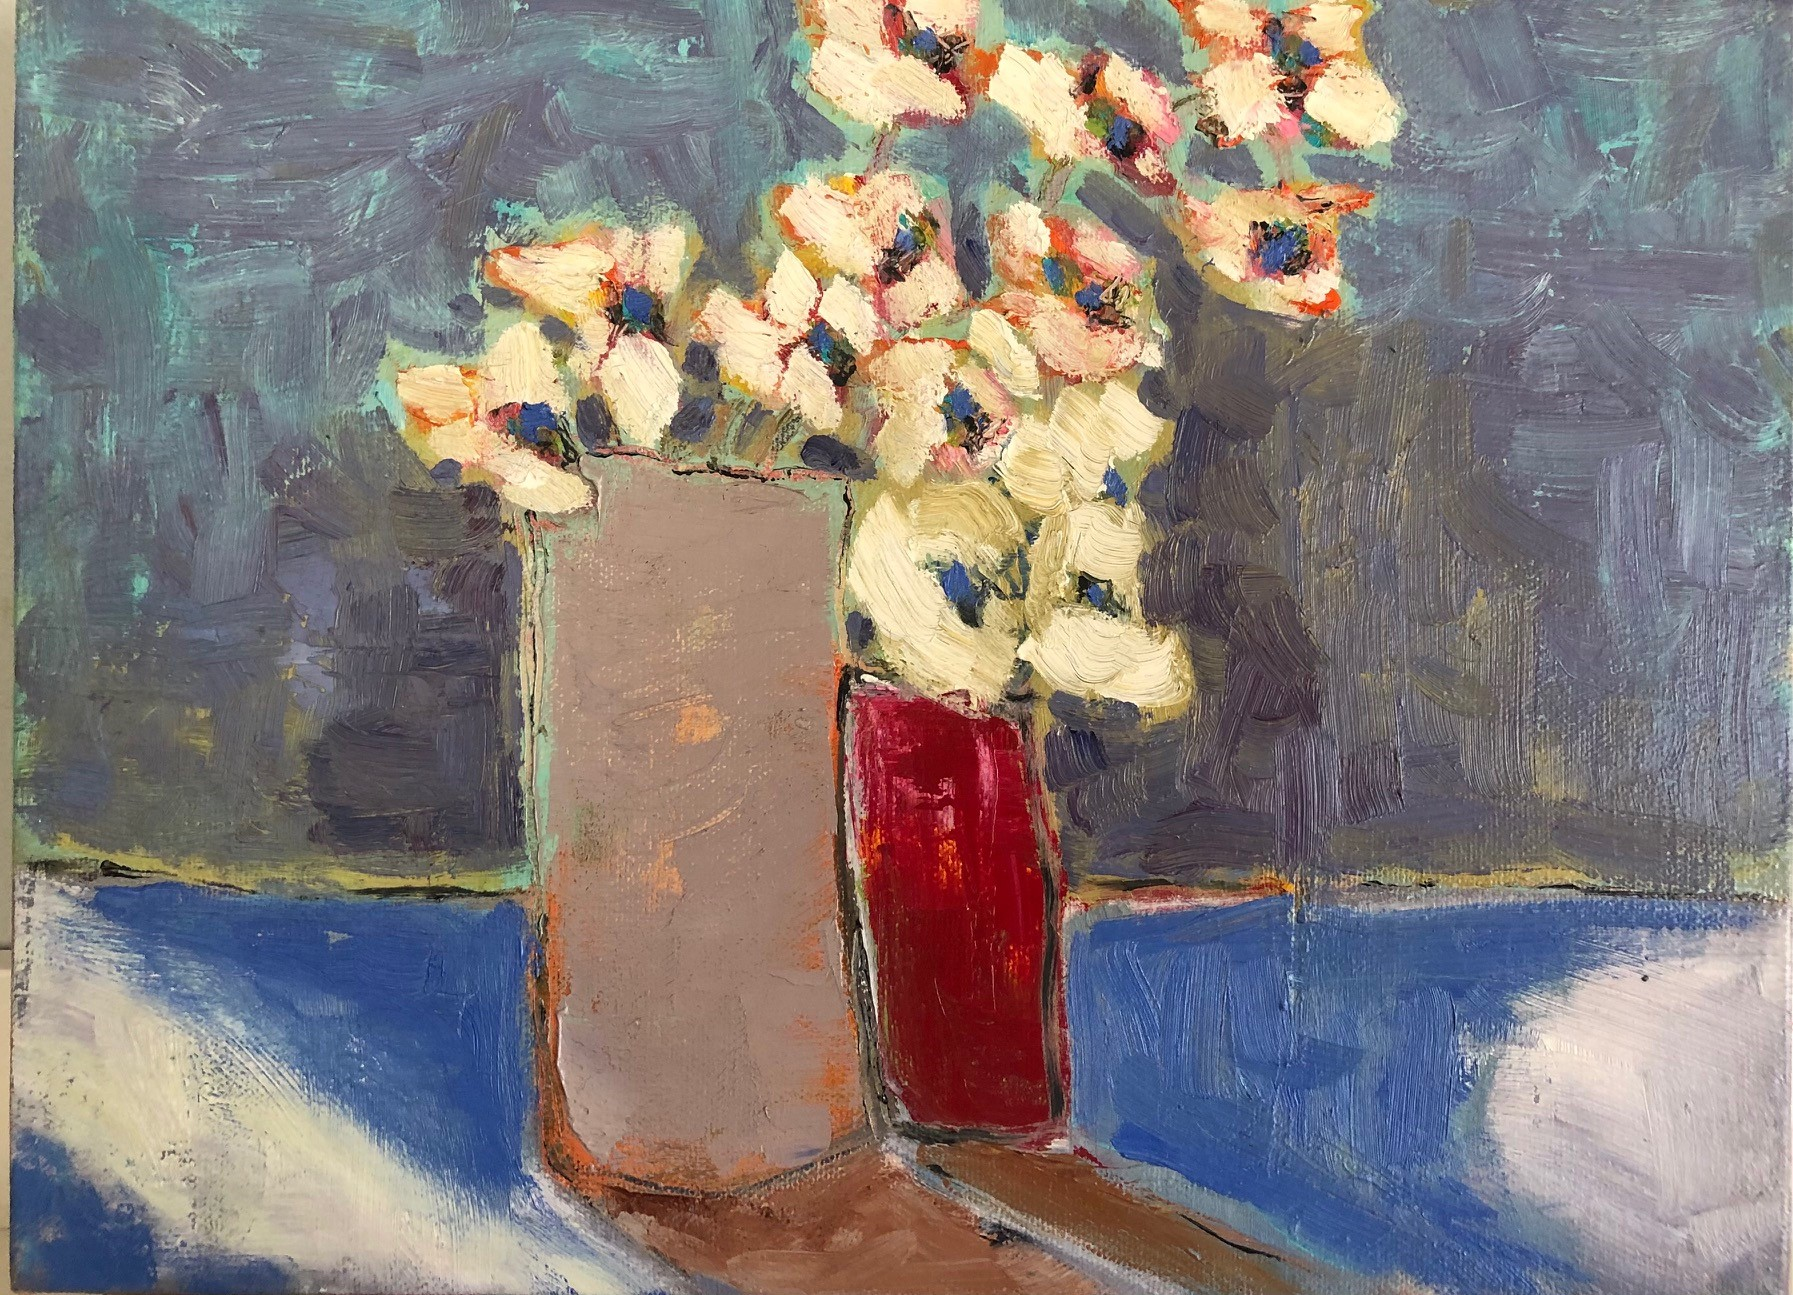 "Cotton Flowers 10"" x 10"", Oil on canvas $175"